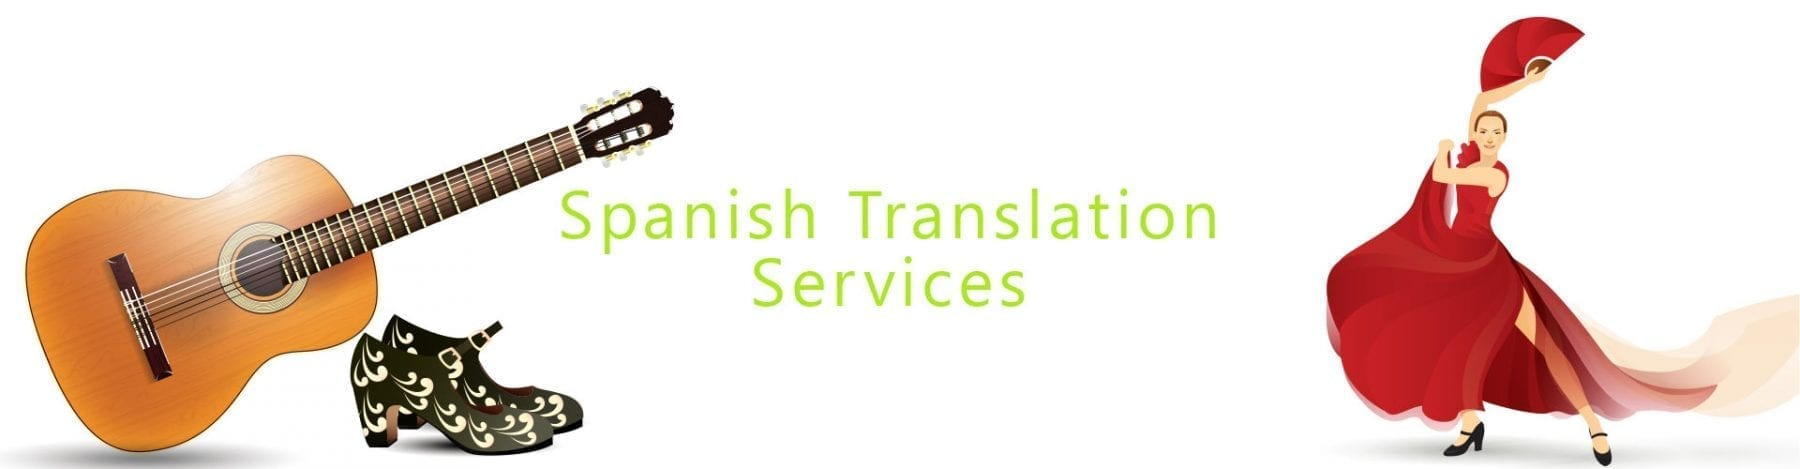 spanish to english document translation services